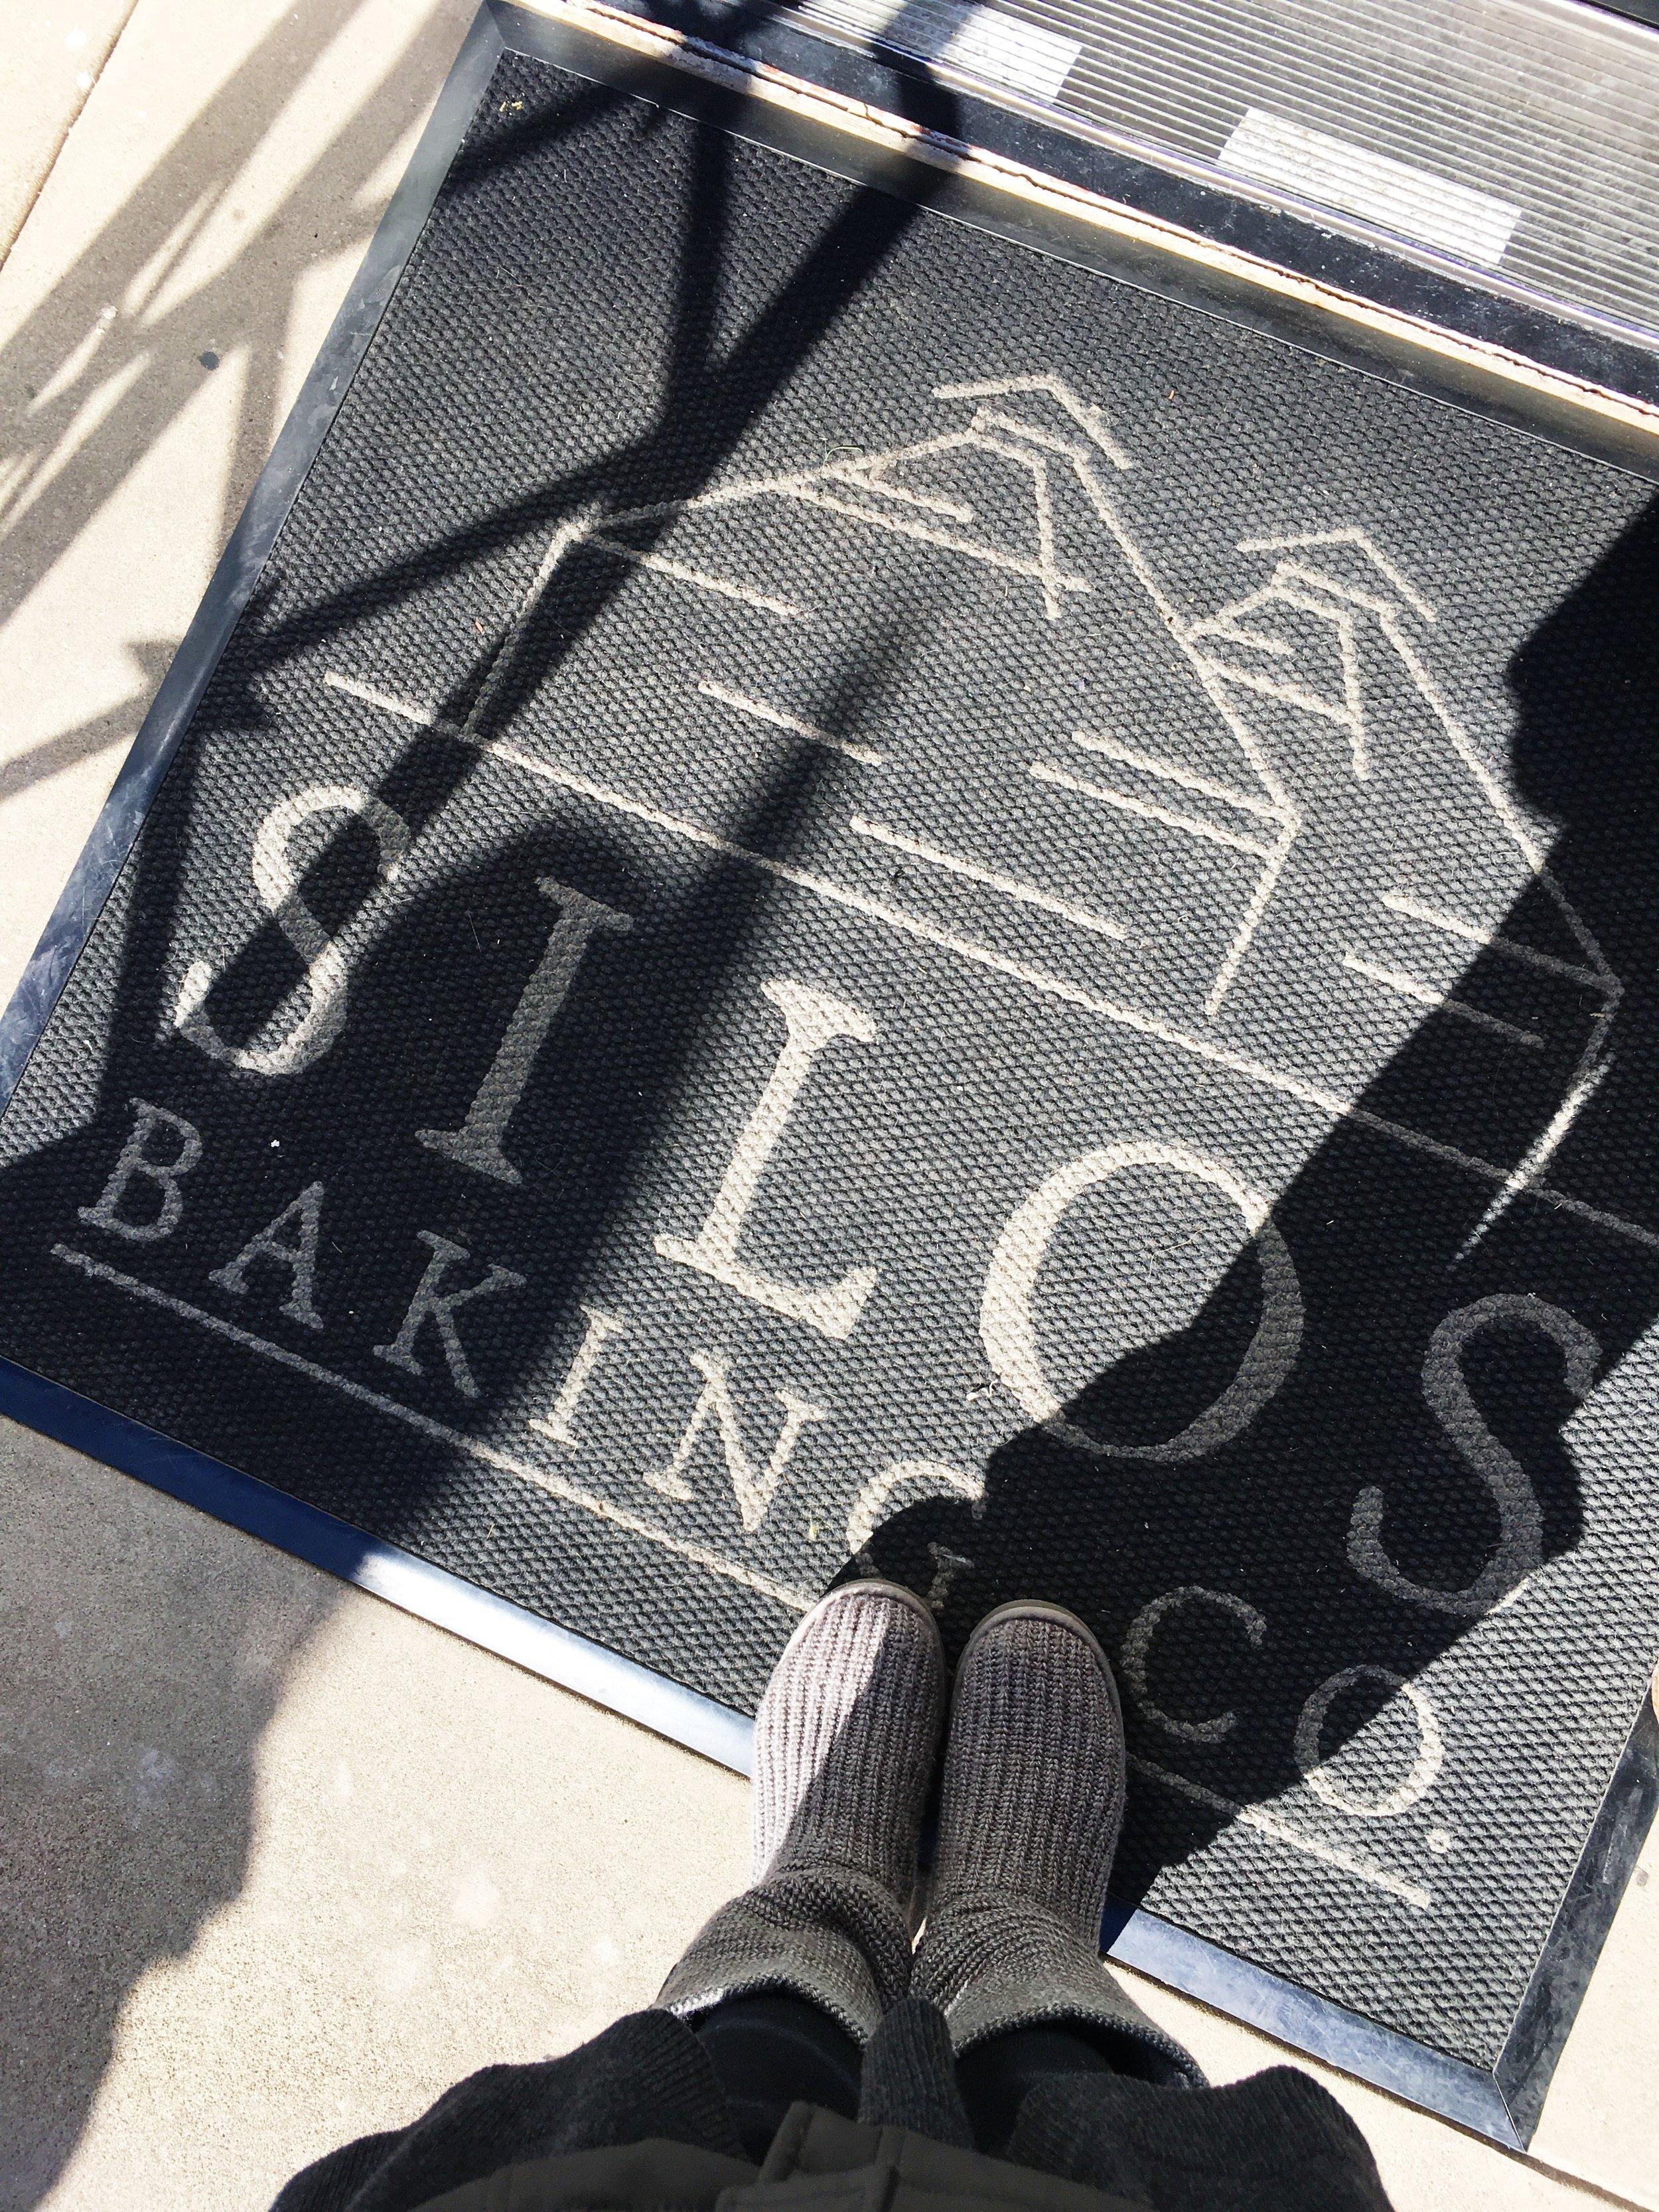 Things to do in Waco, Texas - Silos Baking Co - Wander Dust Blog (5).JPG